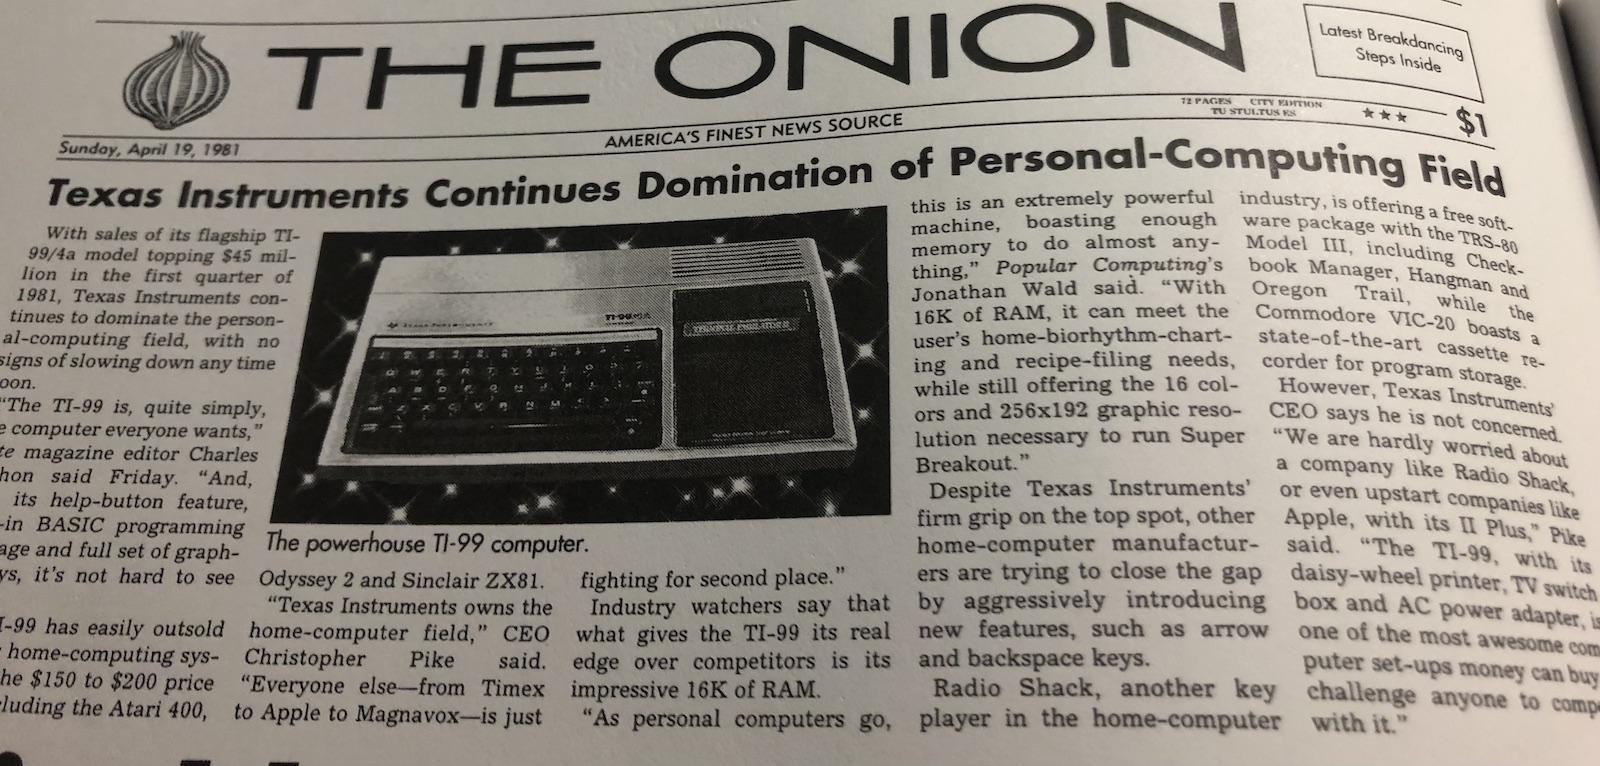 parody headline from the Onion praising TI computer